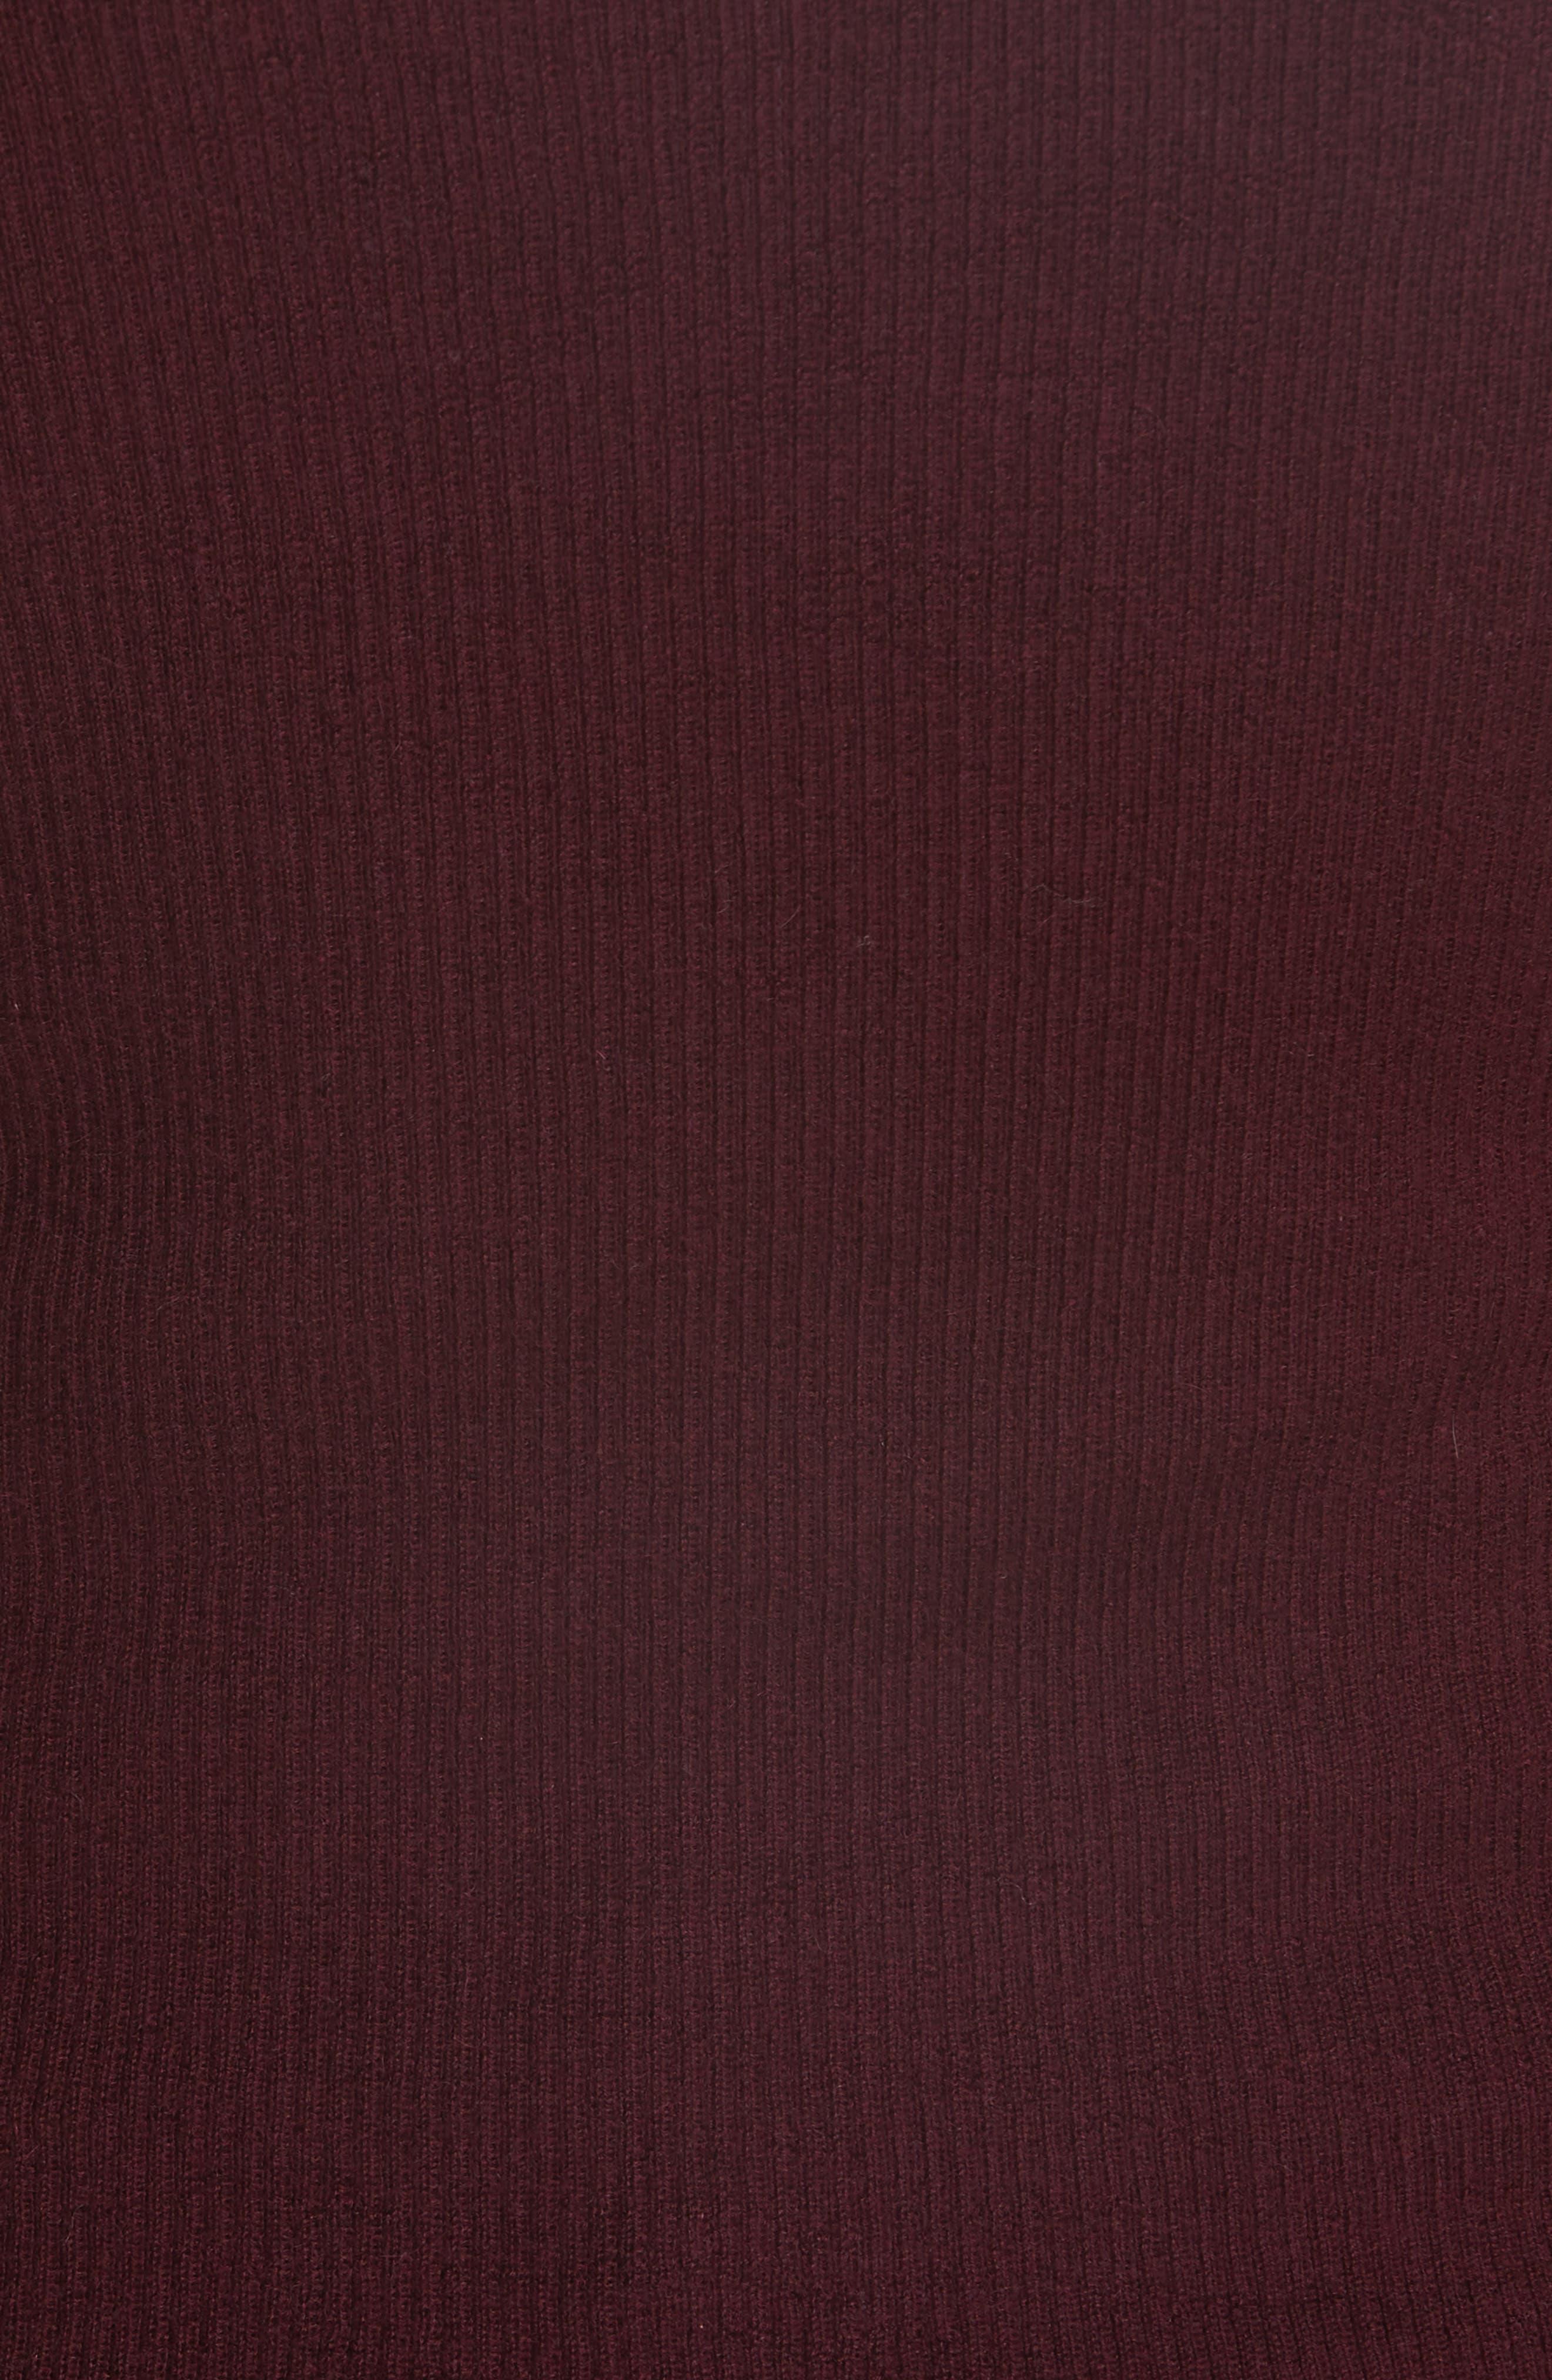 Fine Line Cardigan,                             Alternate thumbnail 5, color,                             930